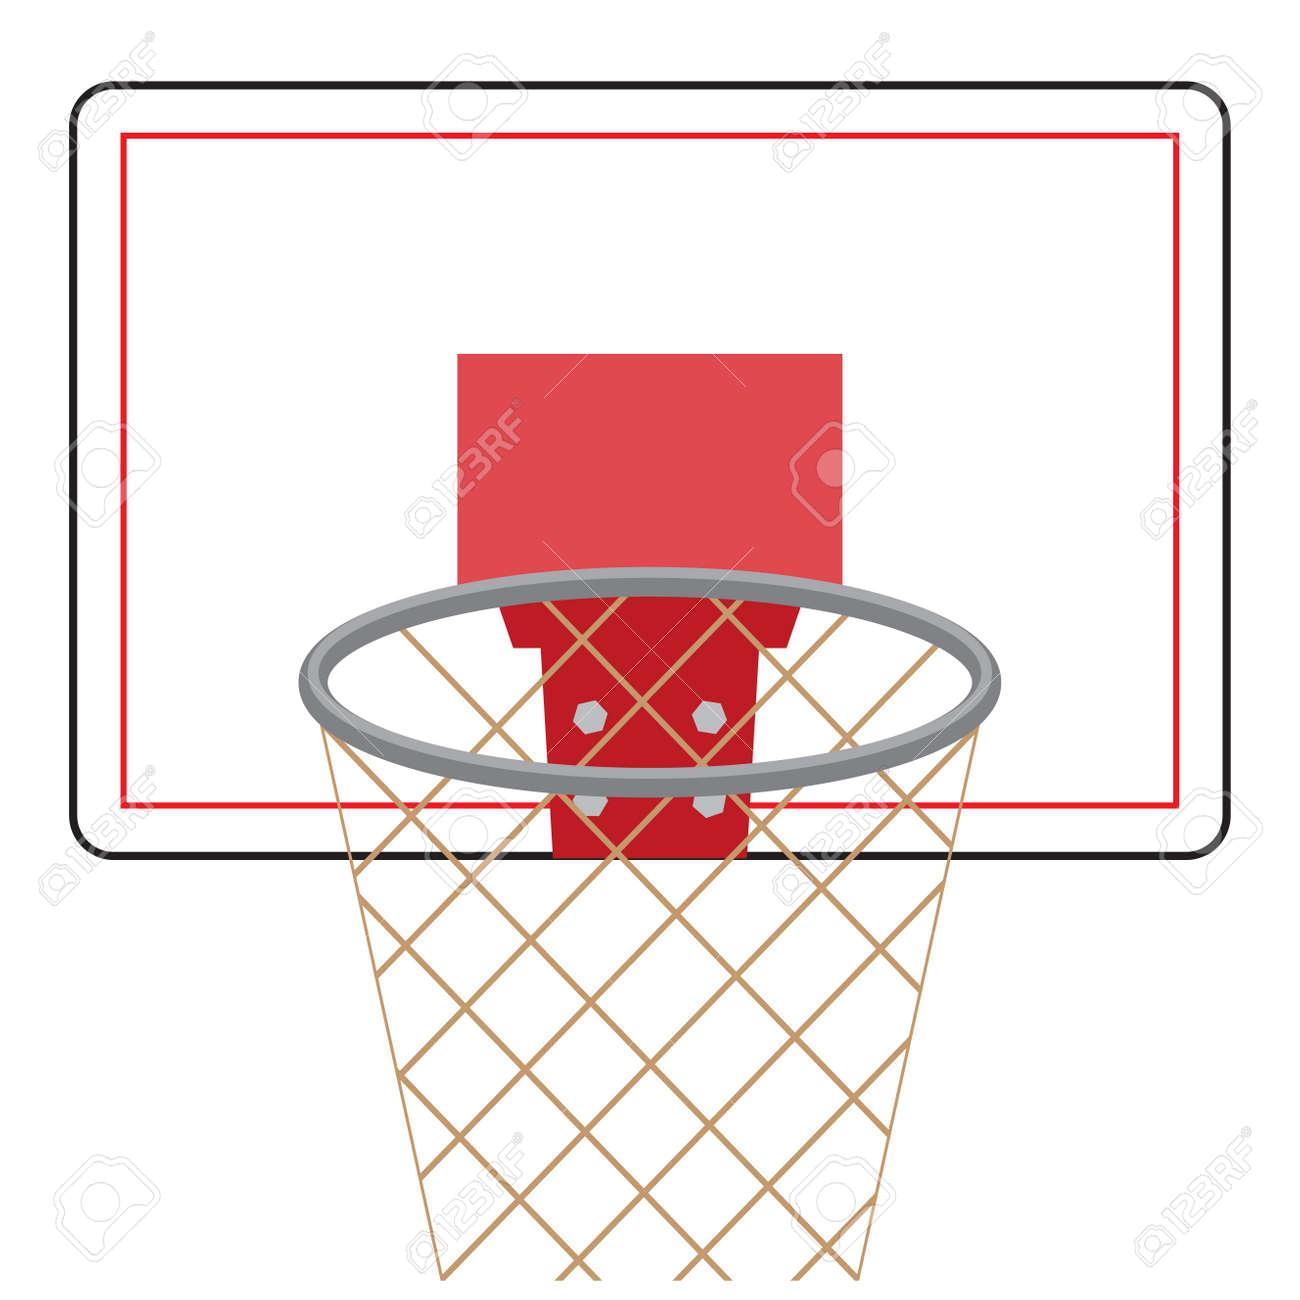 Basketball Board And Ring Basketball And Basketball Hoop